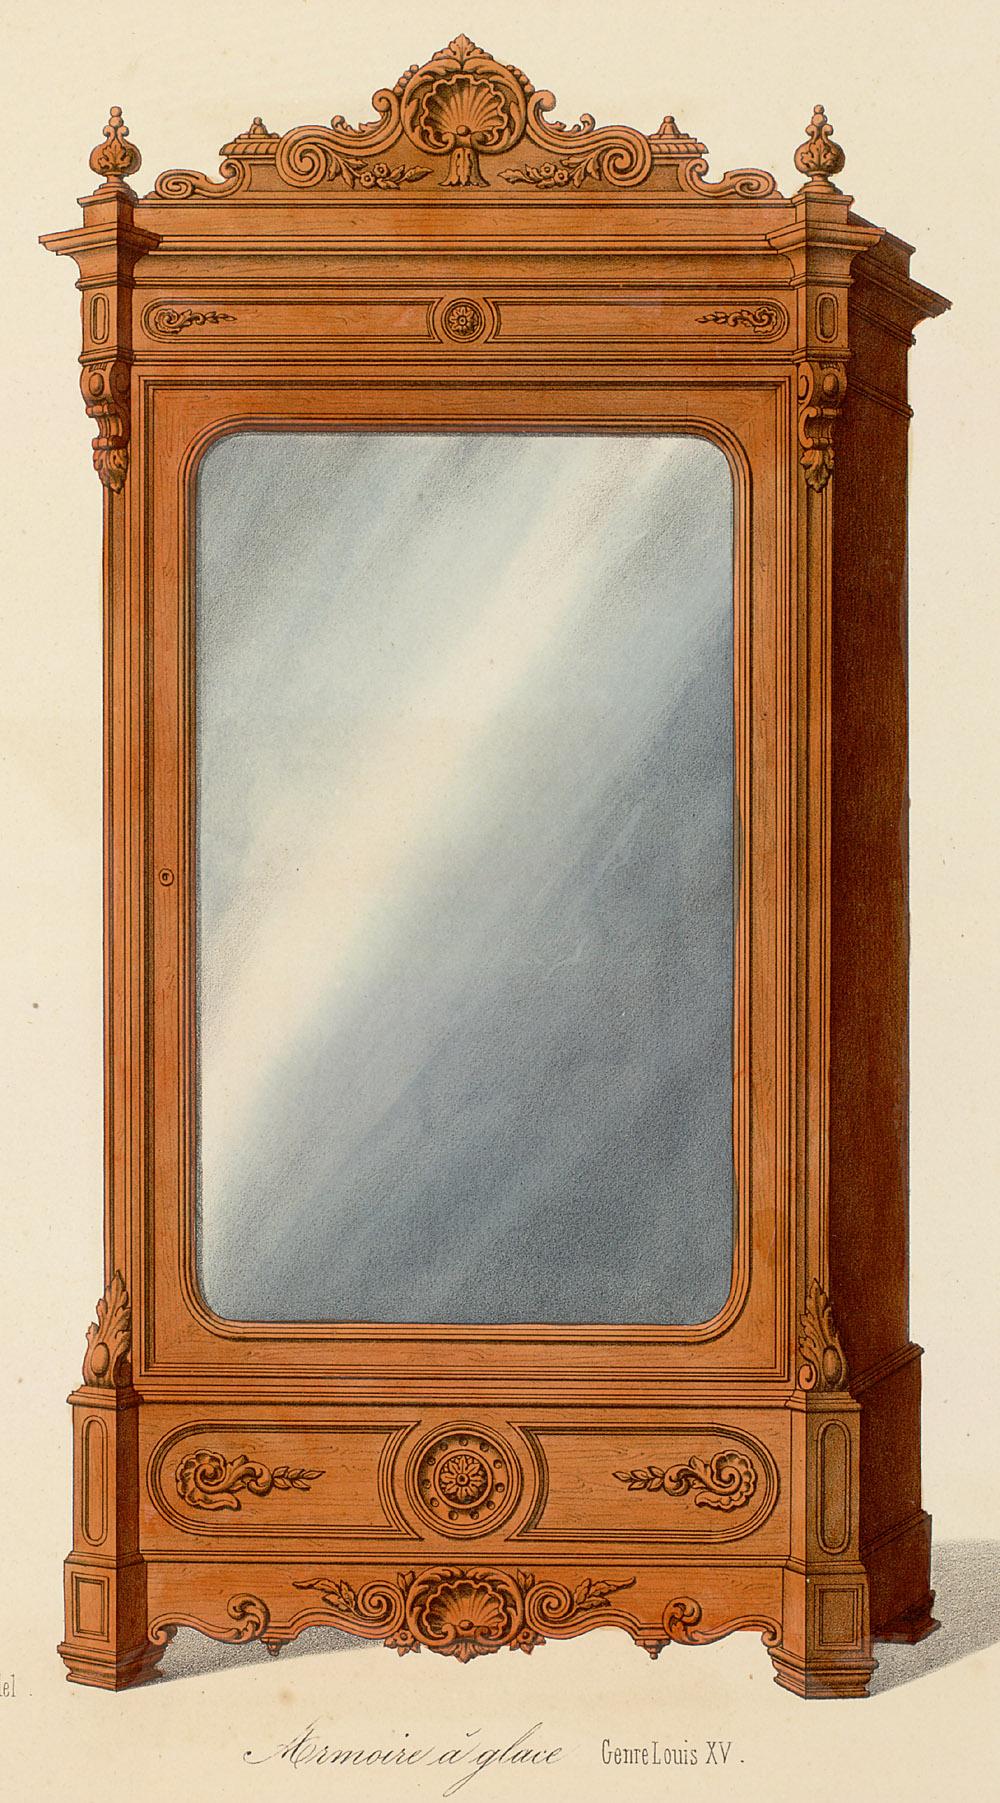 Cabinets (case furniture),  Image number:SIL12-2-435b